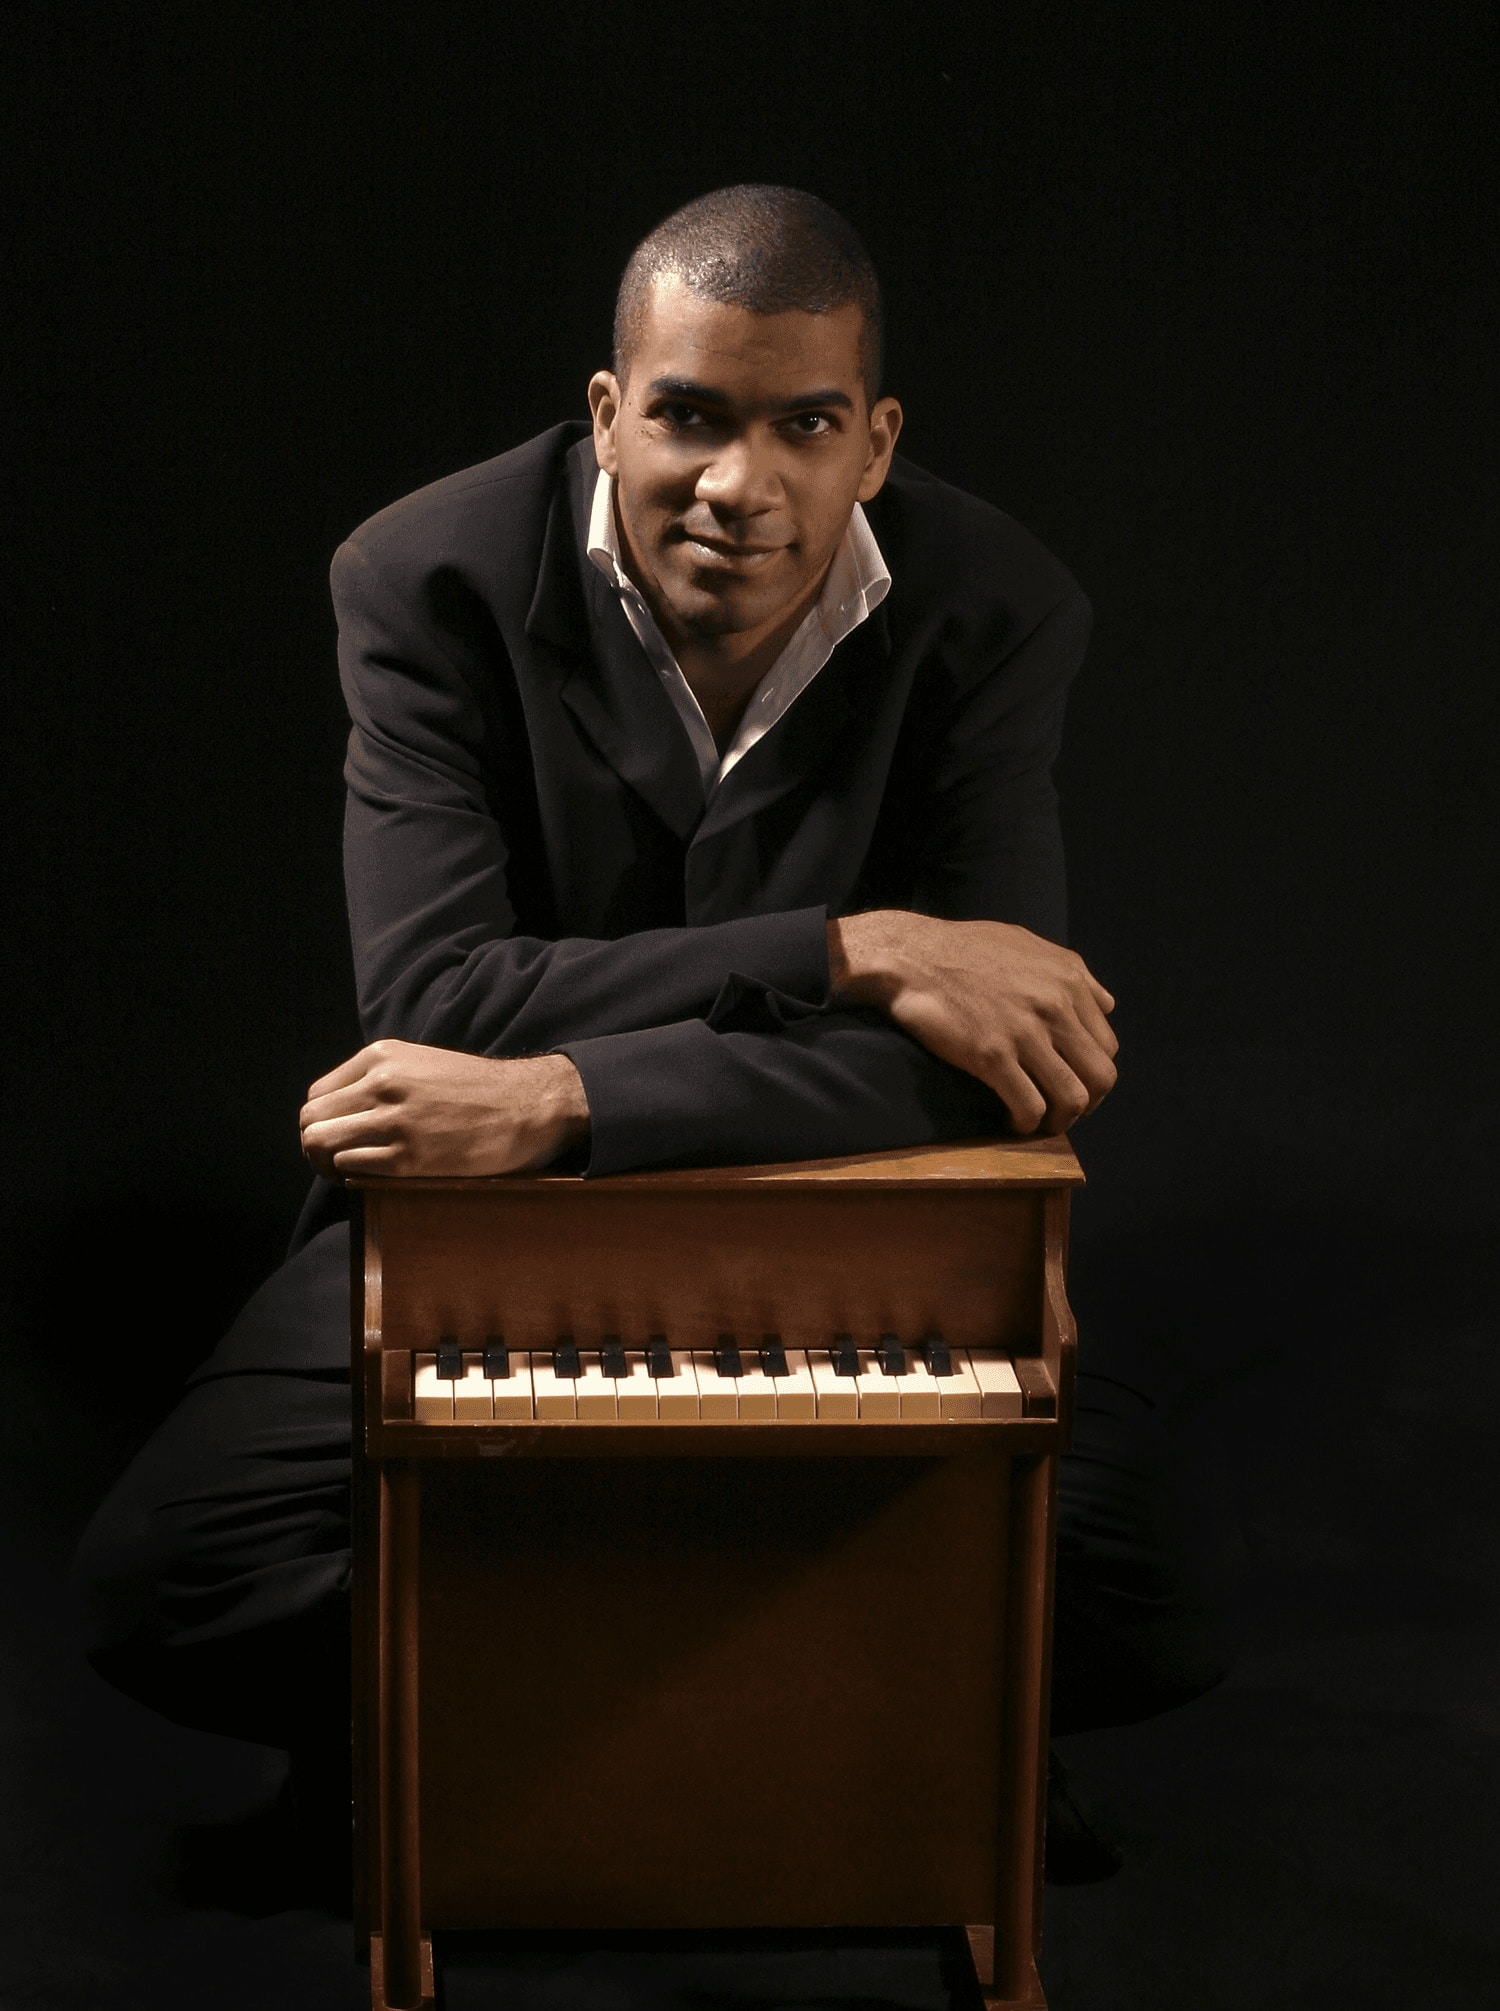 Festival de piano, le pianiste Wilhem Latchoumia